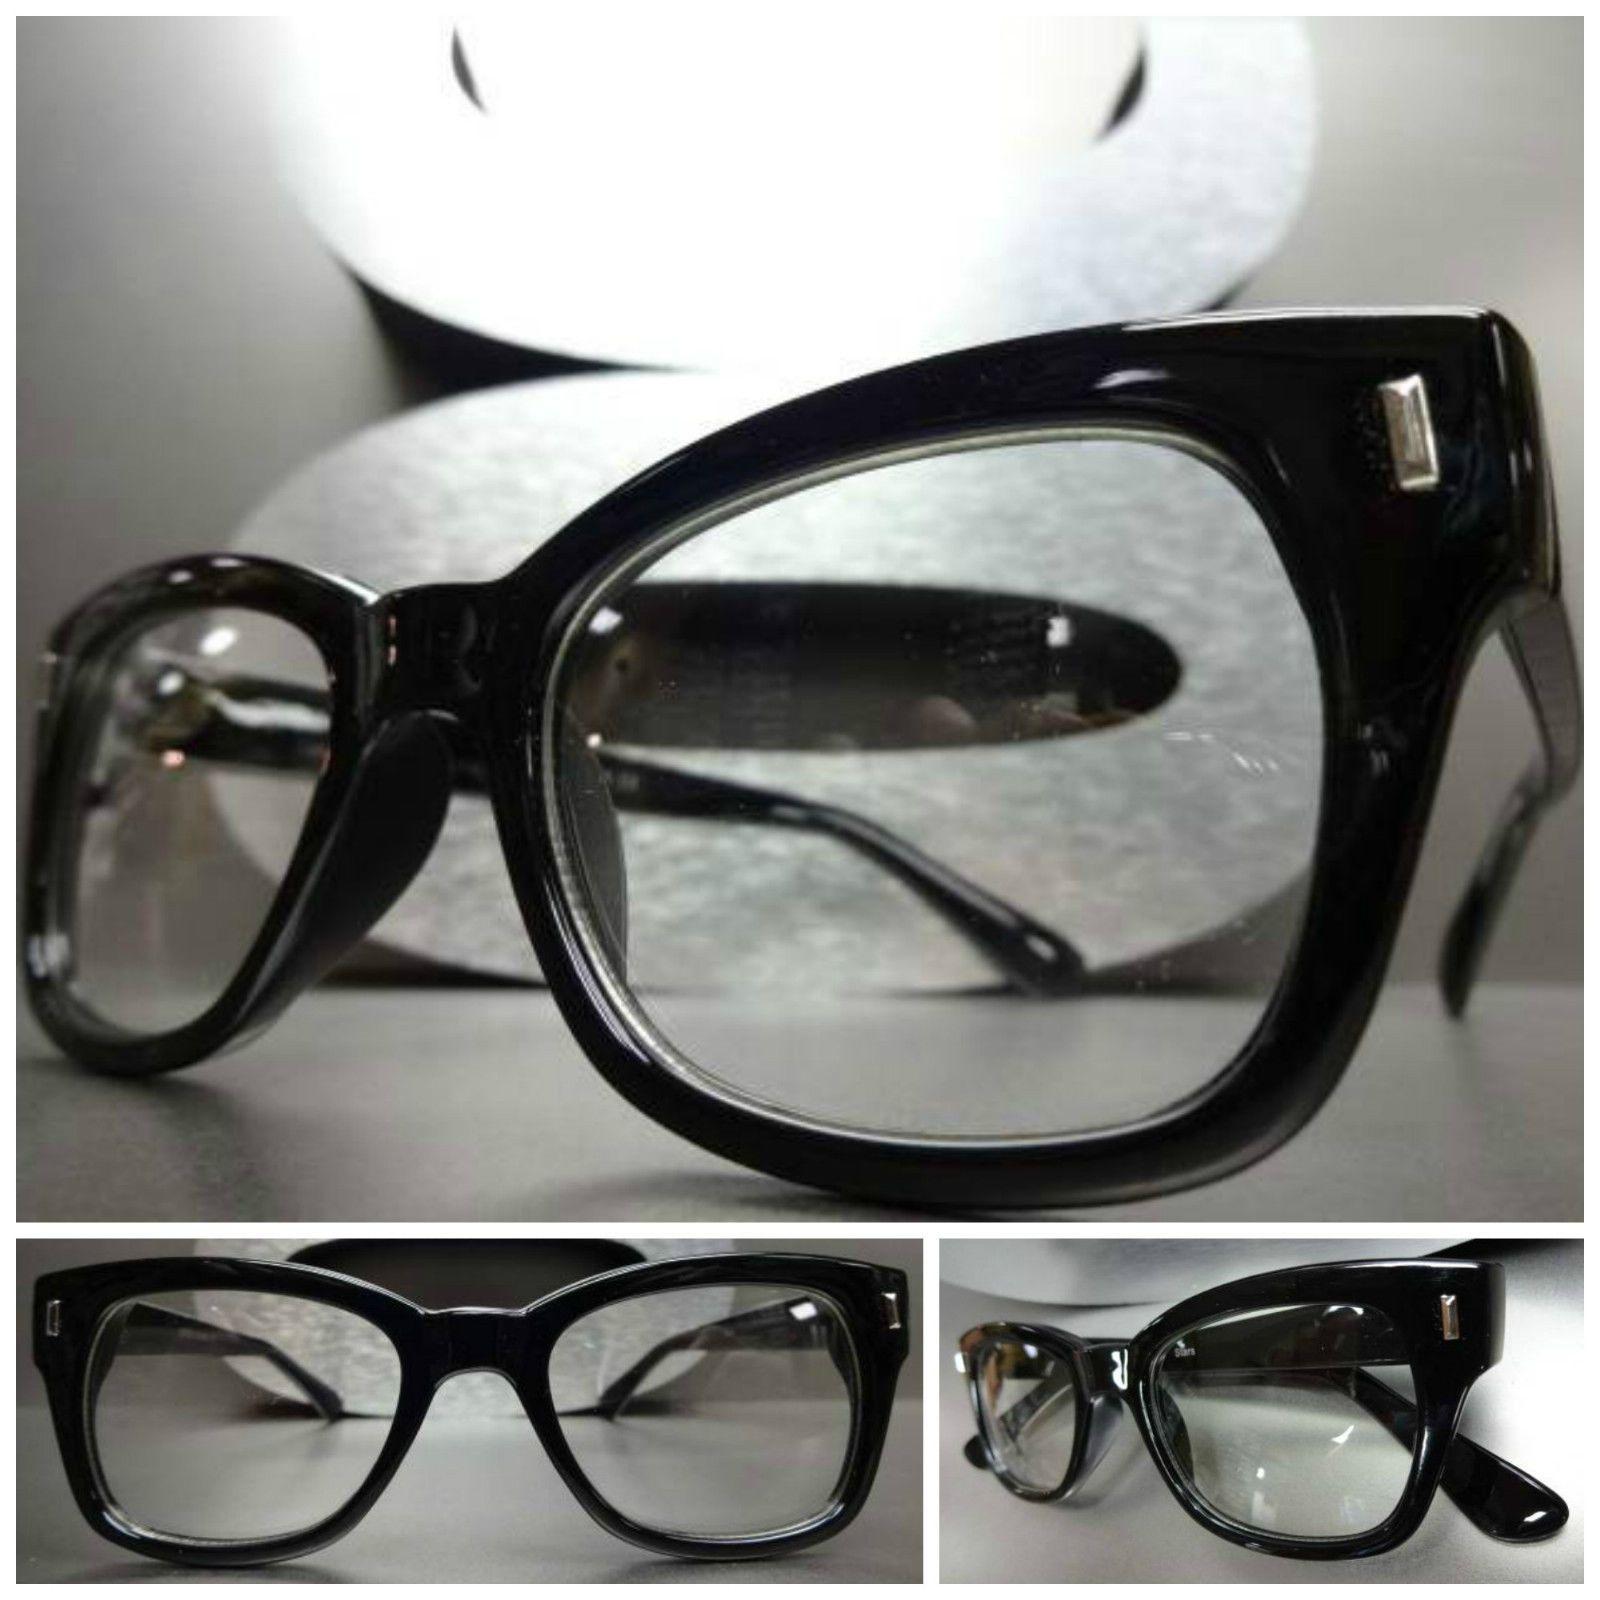 d7fe323896 Men s Women Vintage Retro Style Clear Lens Eye Glasses Thick Black Fashion  Frame